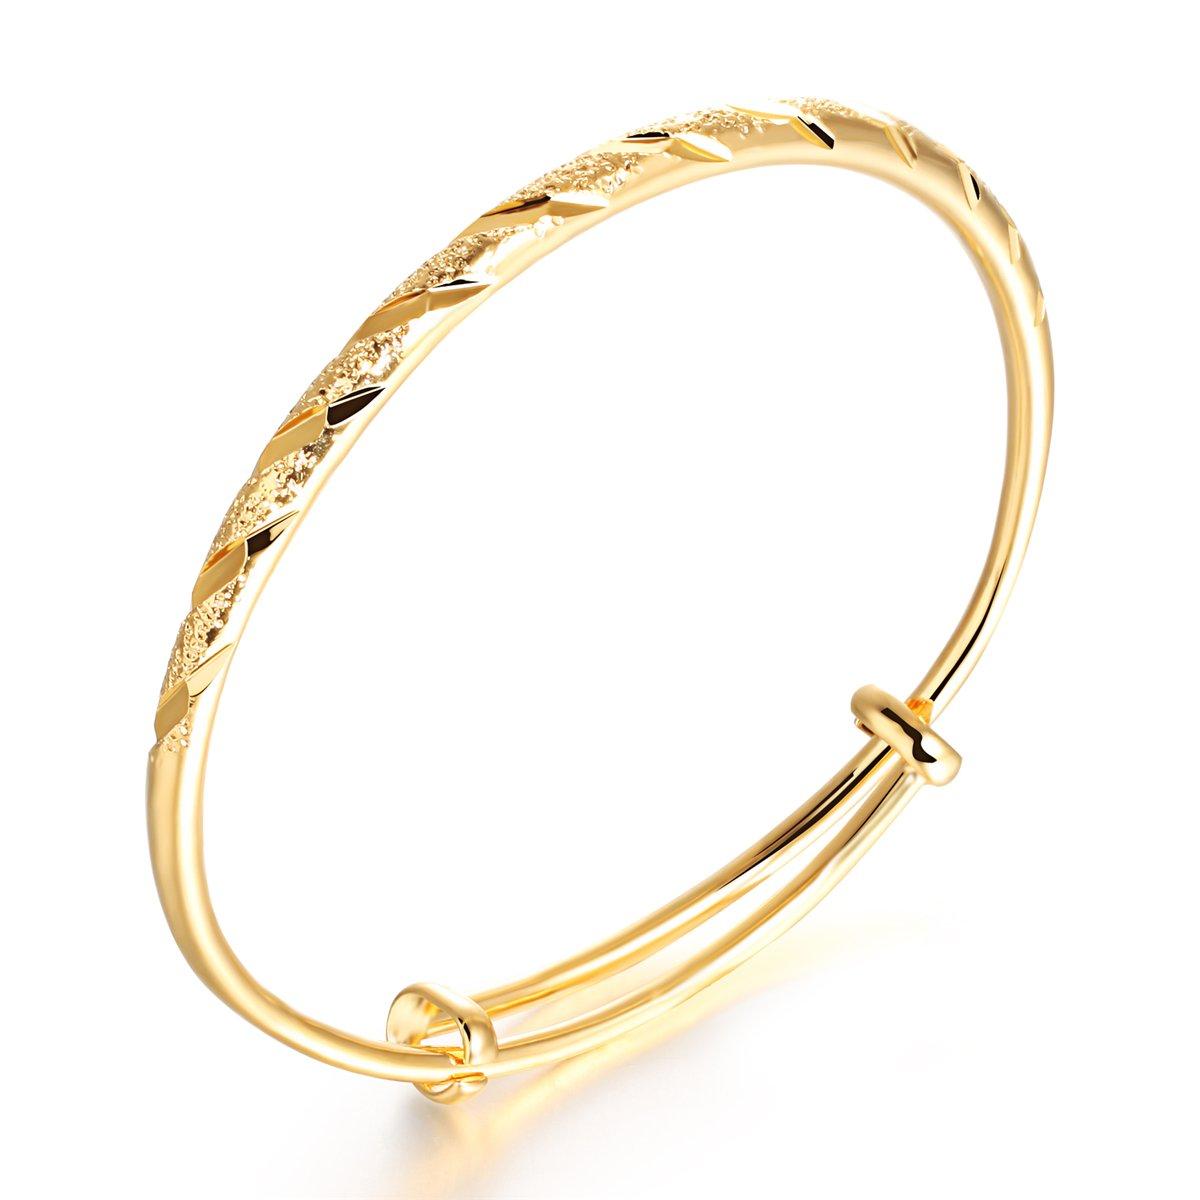 Tiffinys Jewelry Love Bangle Bracelet Elegant Christmas Flower Bangles Women Girls Charming Sparkles Gold Plated Copper Adjustable Classical Cuff Bracelets Gift Xmas Bridal Female